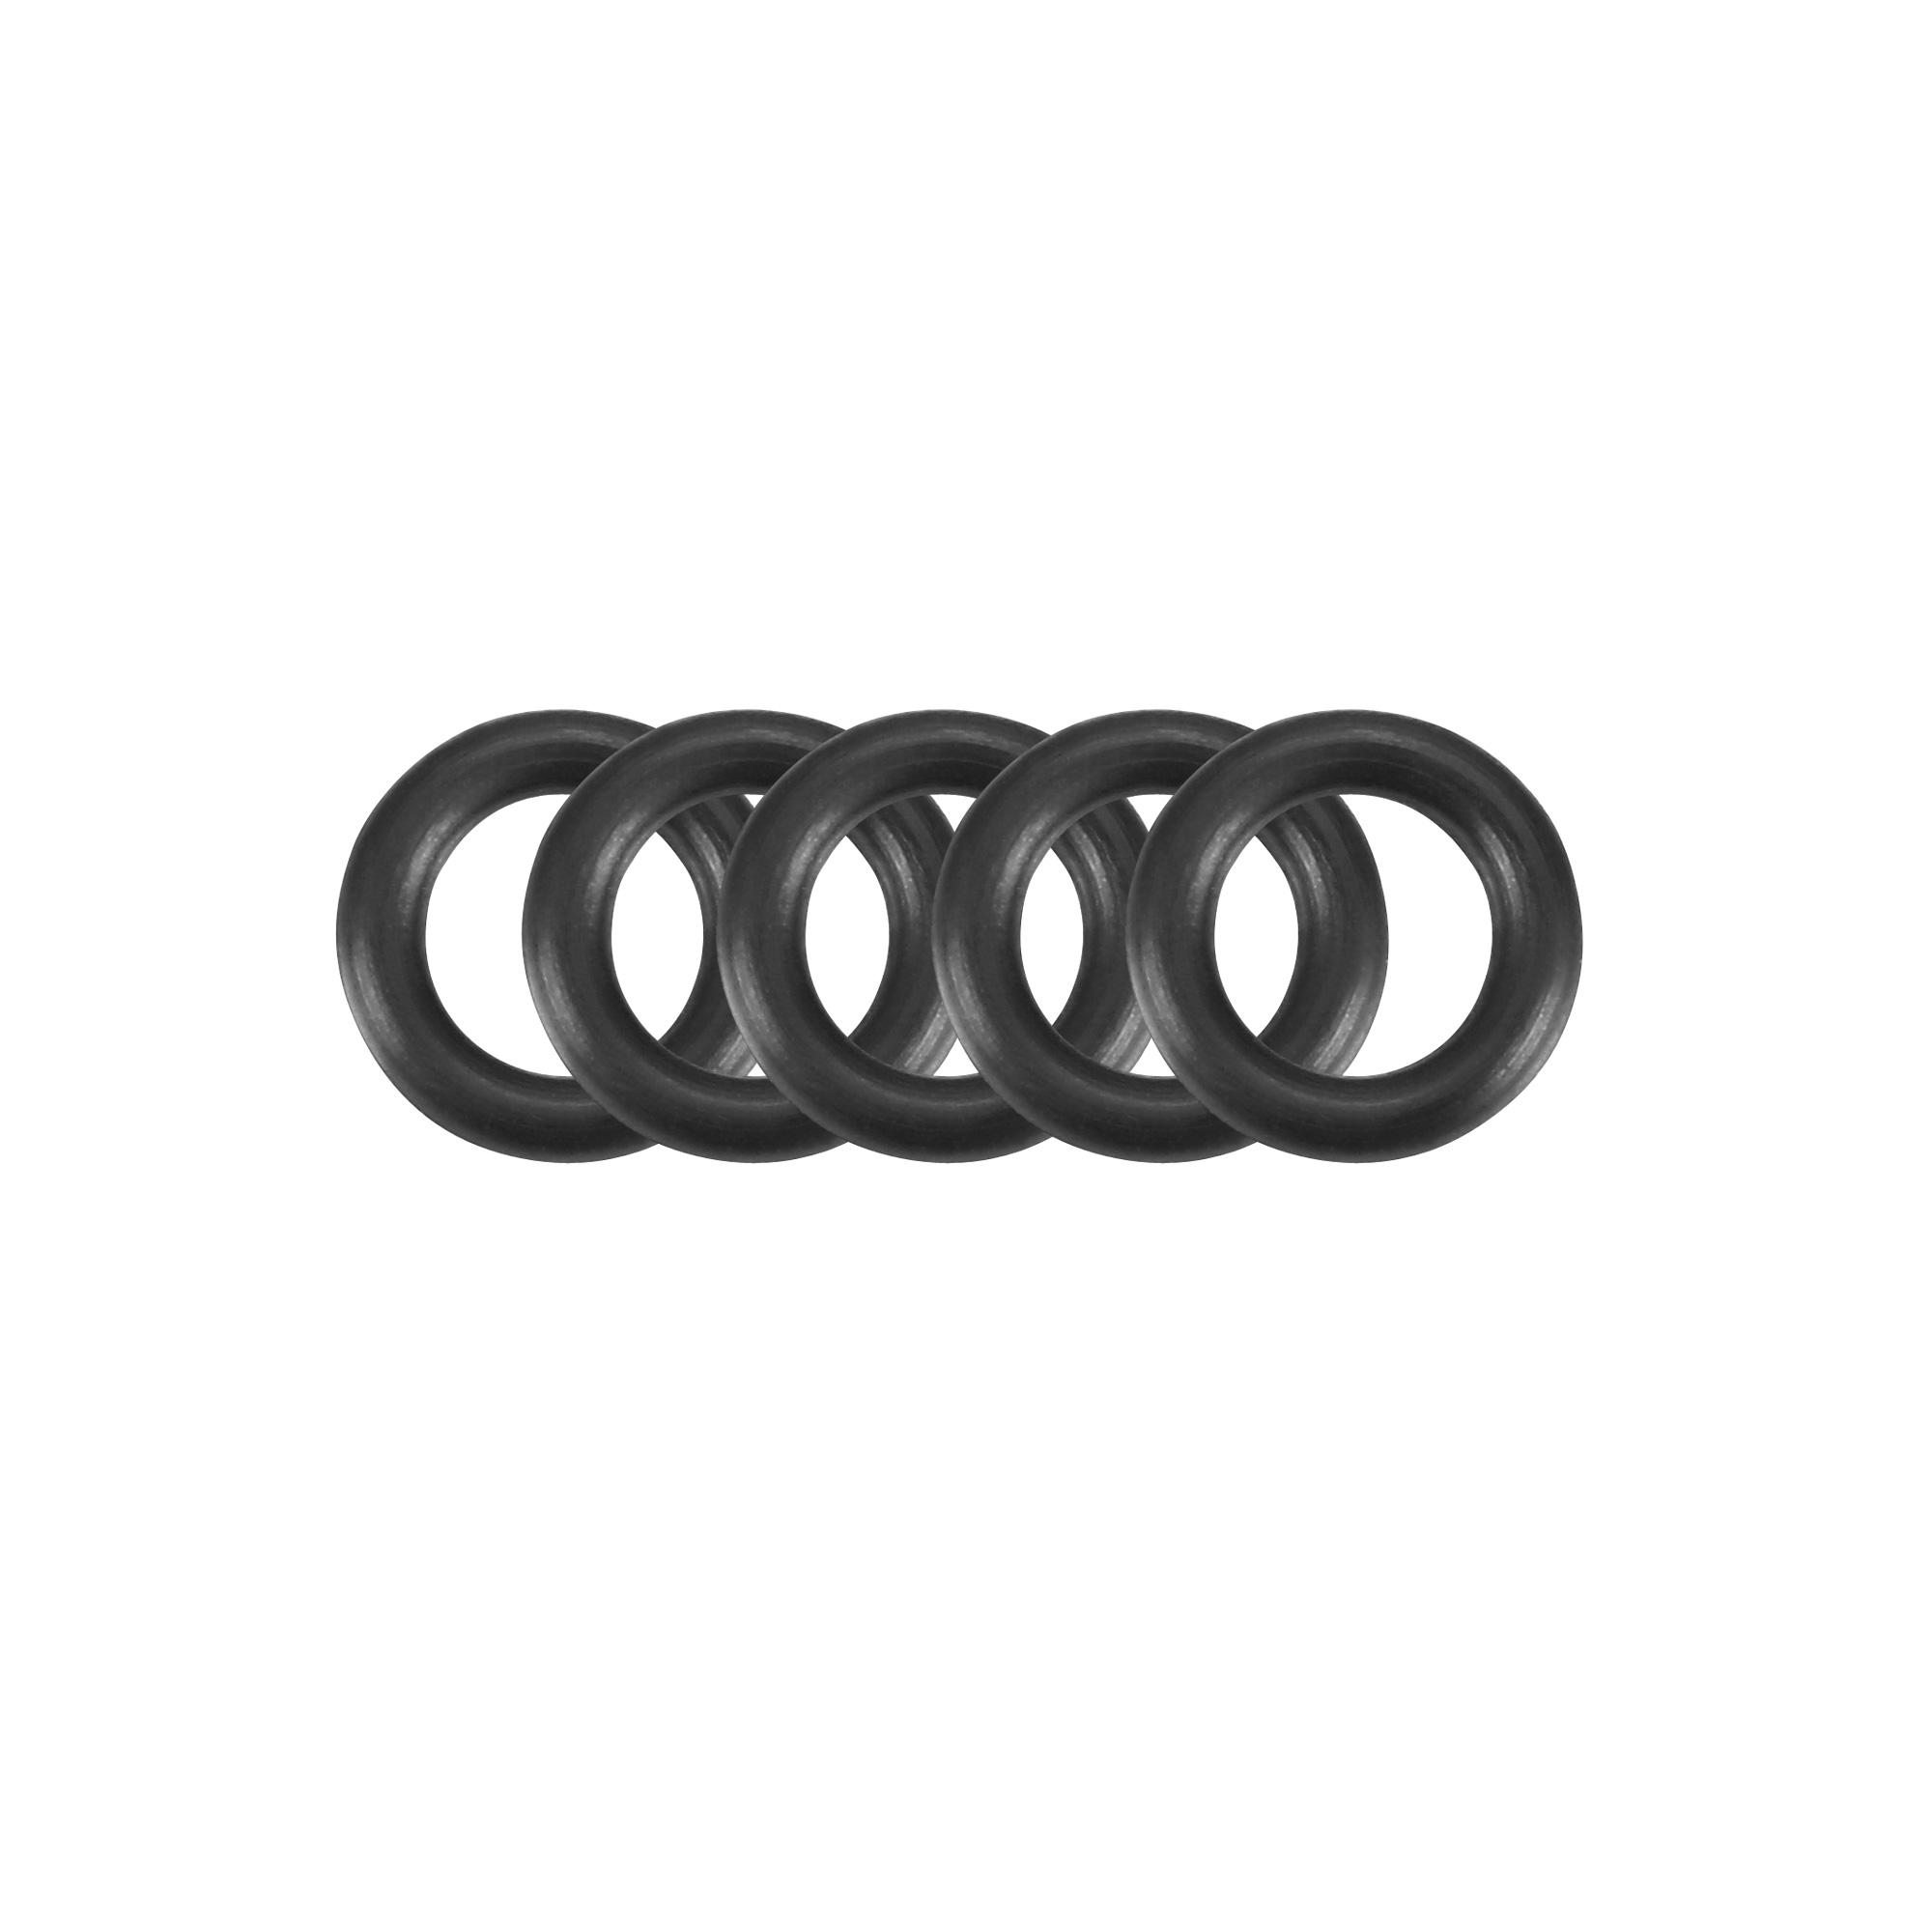 100Pcs Black 1.4mm x 0.8mm Nitrile Rubber O Ring NBR Oil Sealing Grommets